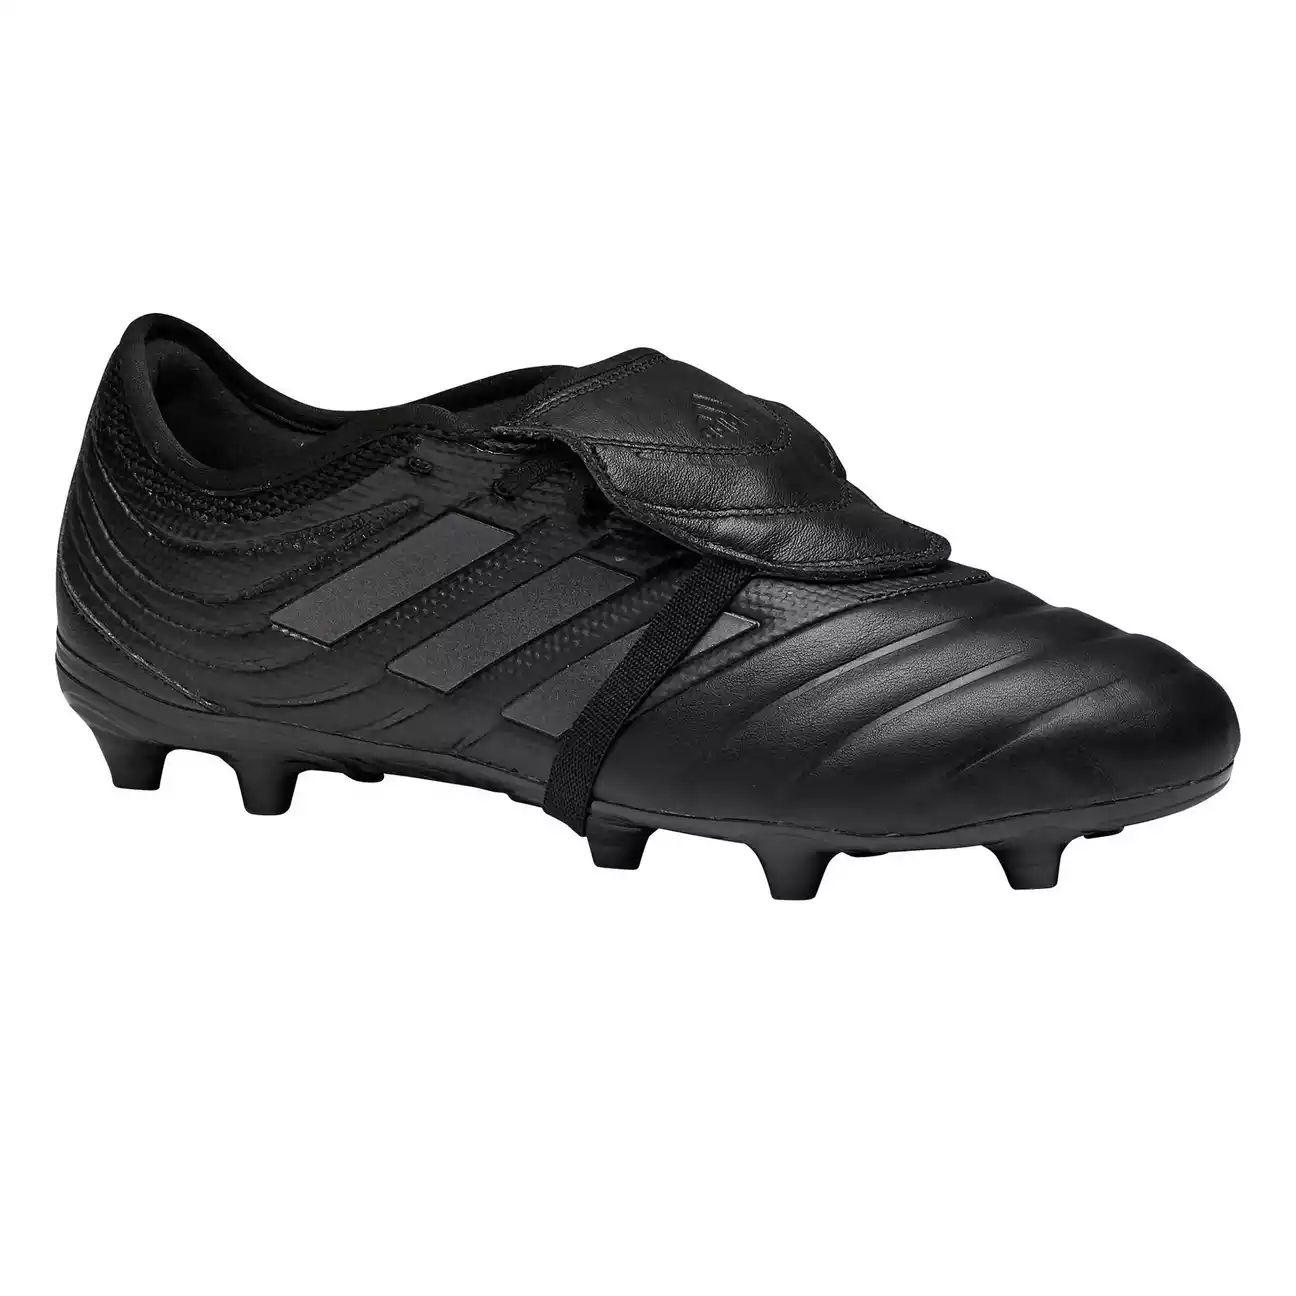 Adidas Fußballschuhe Copa Gloro 19.2